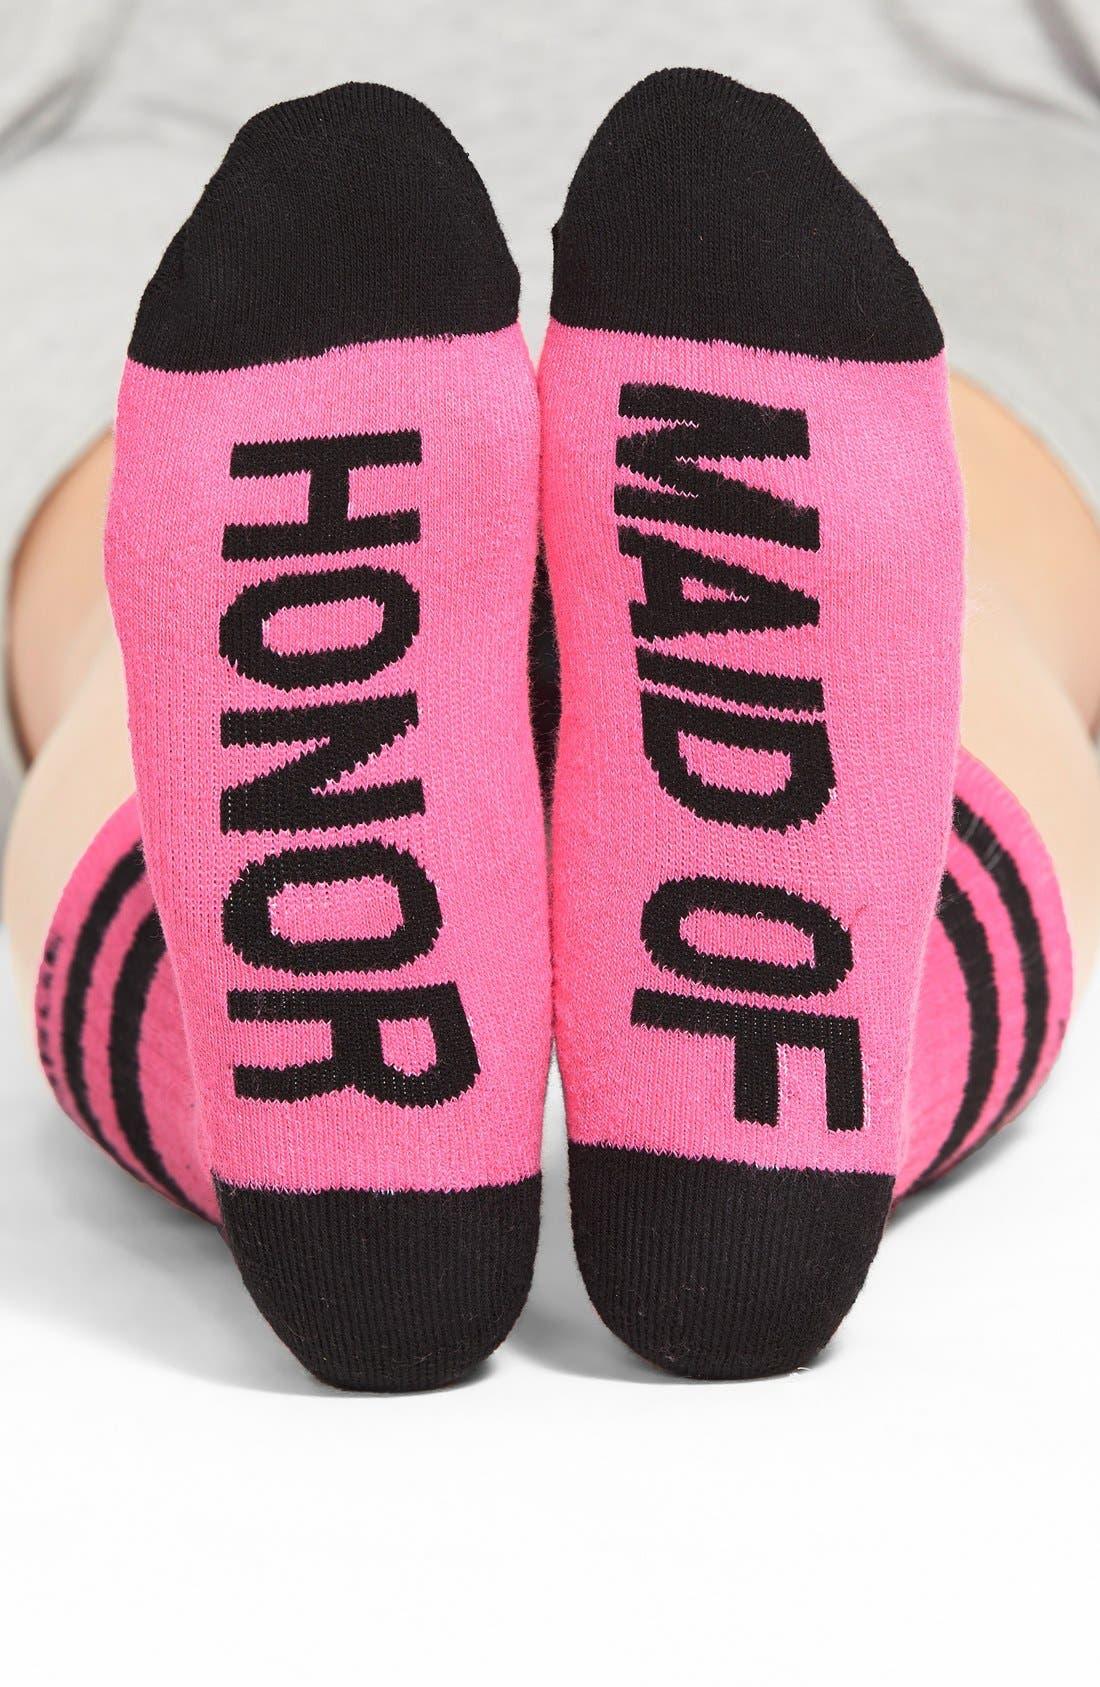 Main Image - Arthur George by R. Kardashian 'Maid of Honor' Crew Socks